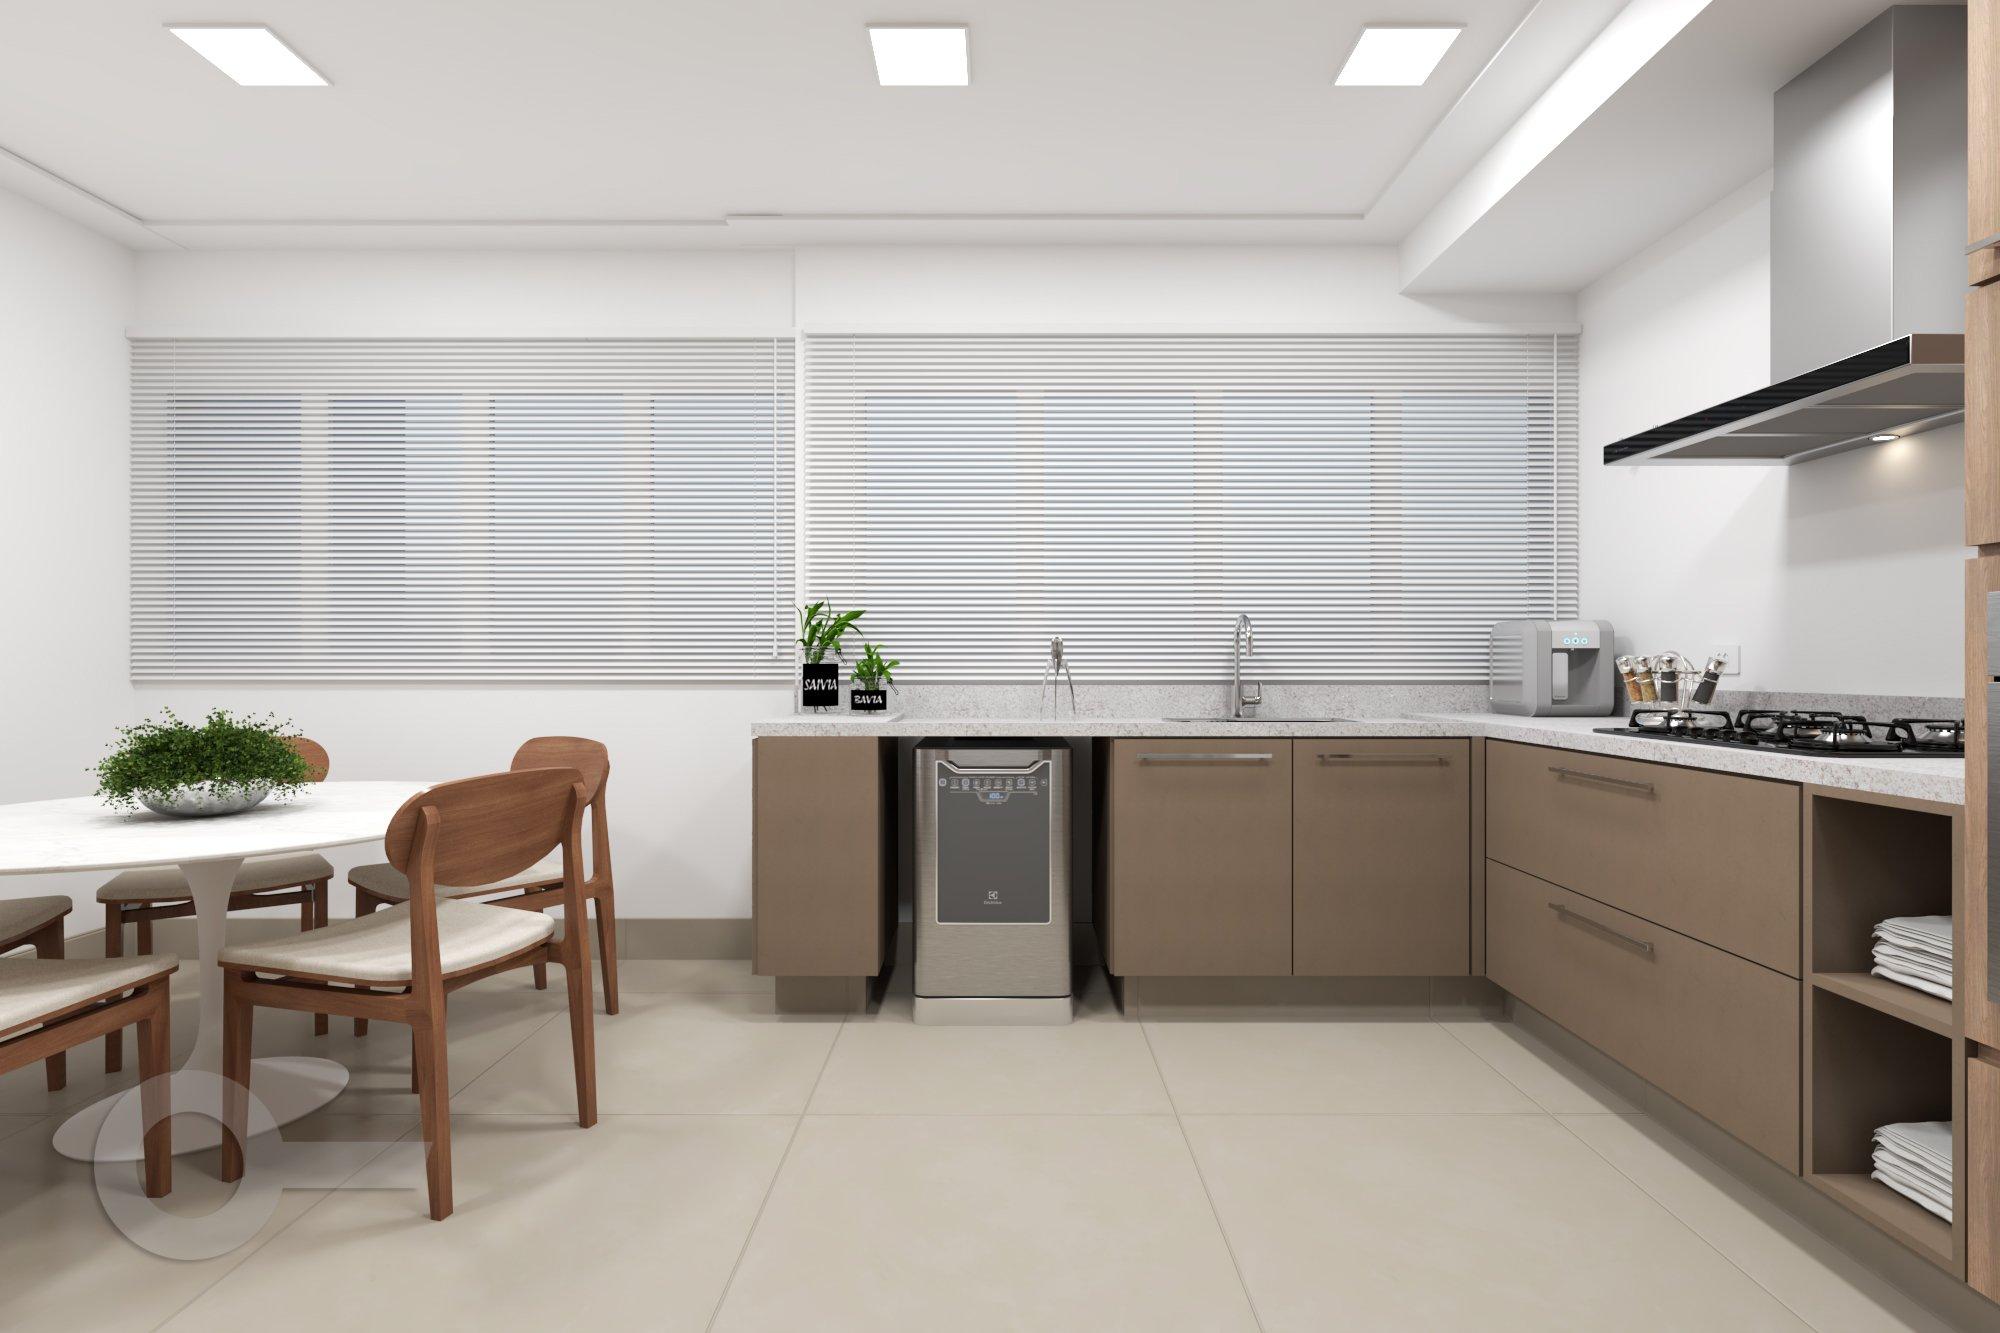 desktop_kitchen1.jfif